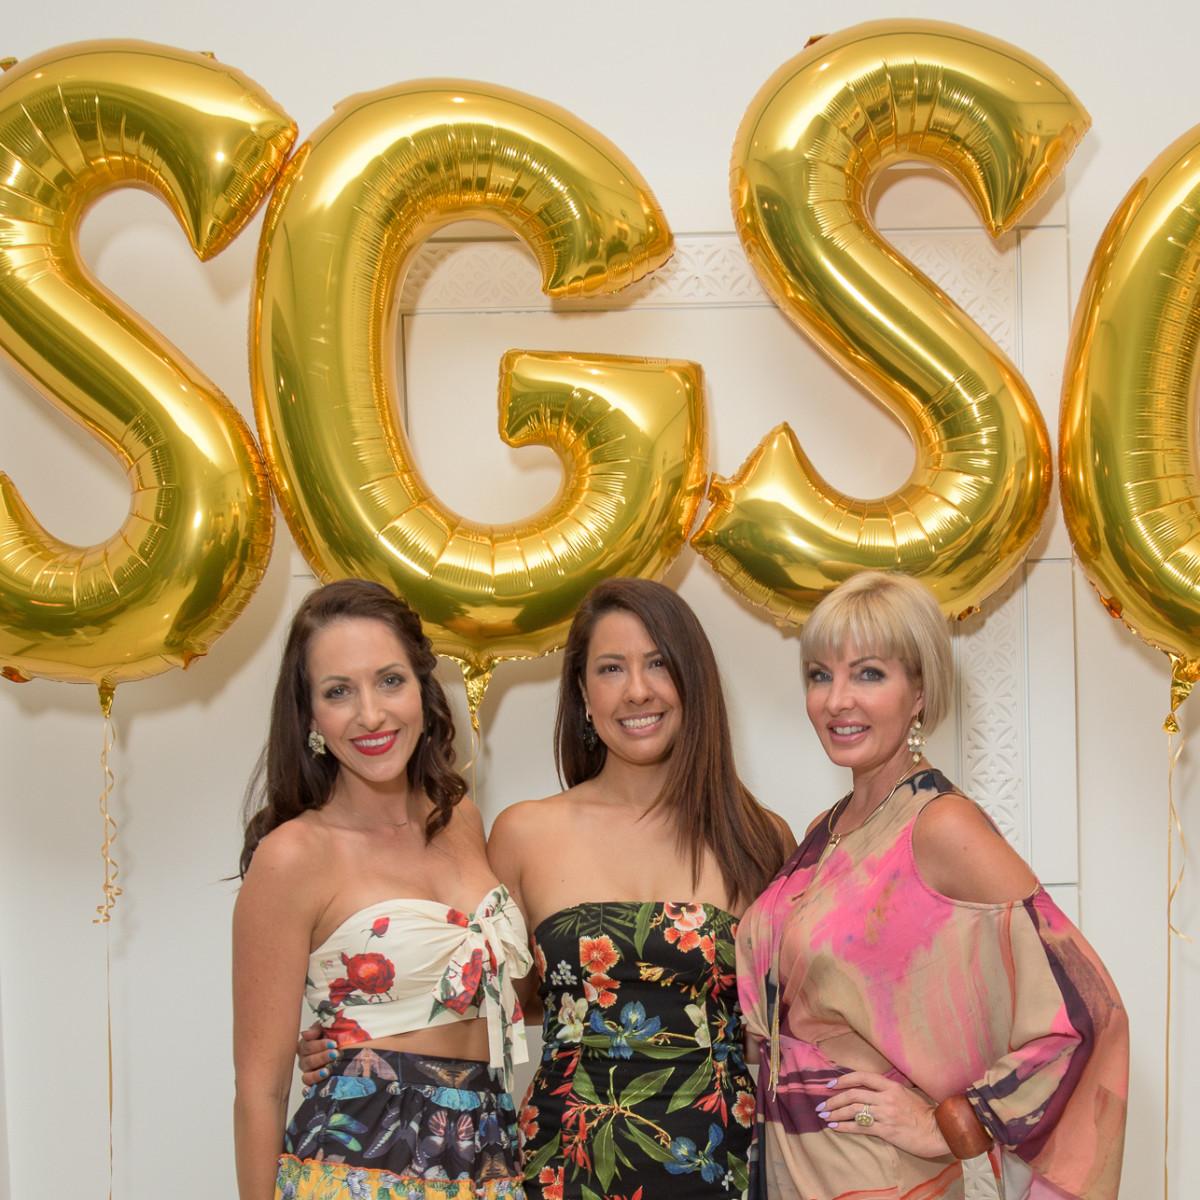 Original SGSC founders Shannah Quinn, Anika Jackson Redick, and Staci Henderson